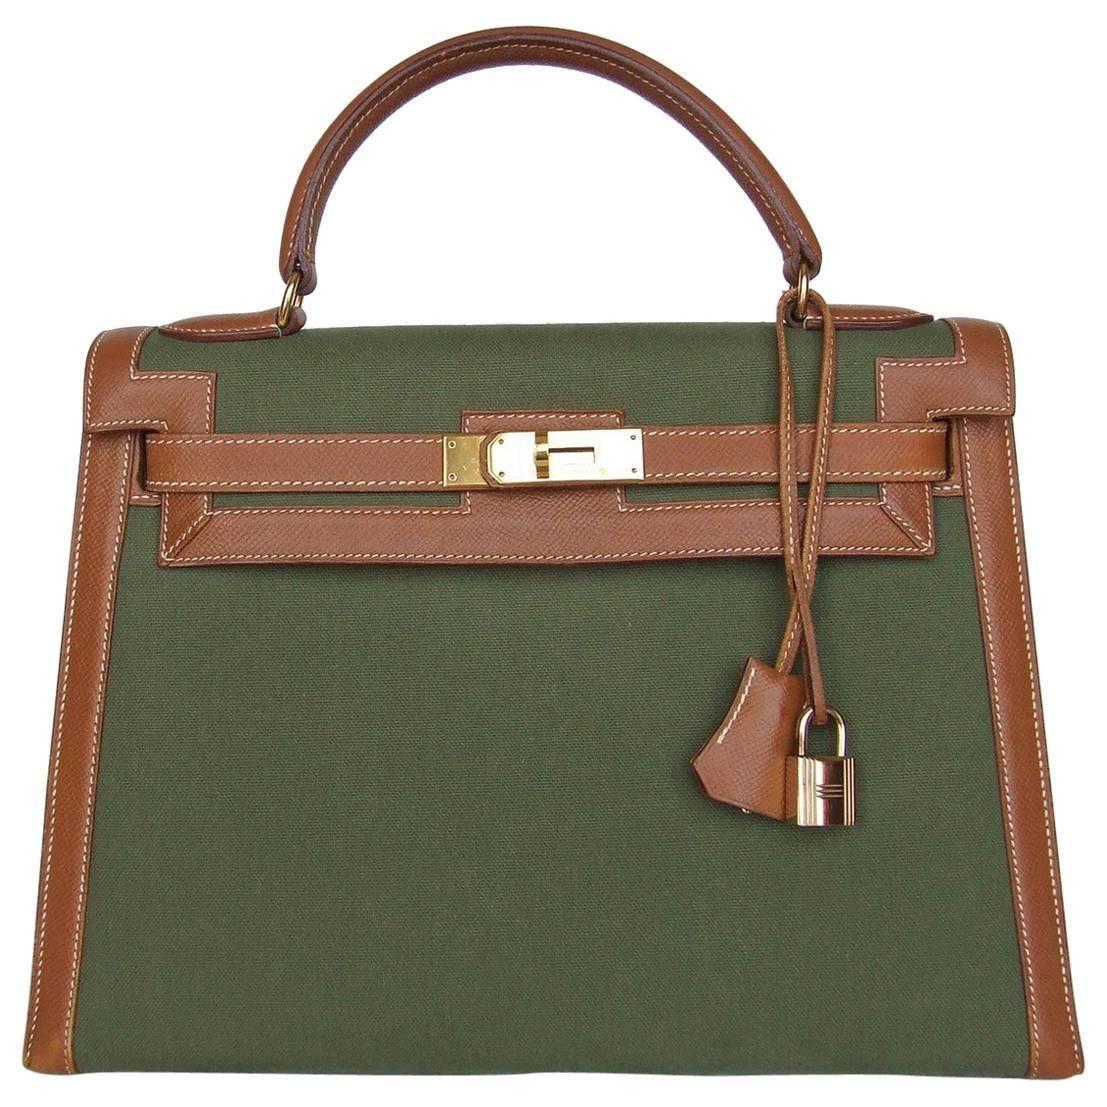 Hermes Kelly 32 Sellier Bag Bi Matiere Green Canvas Cognac Leather GHW Rare   af77c5c6c9b8d